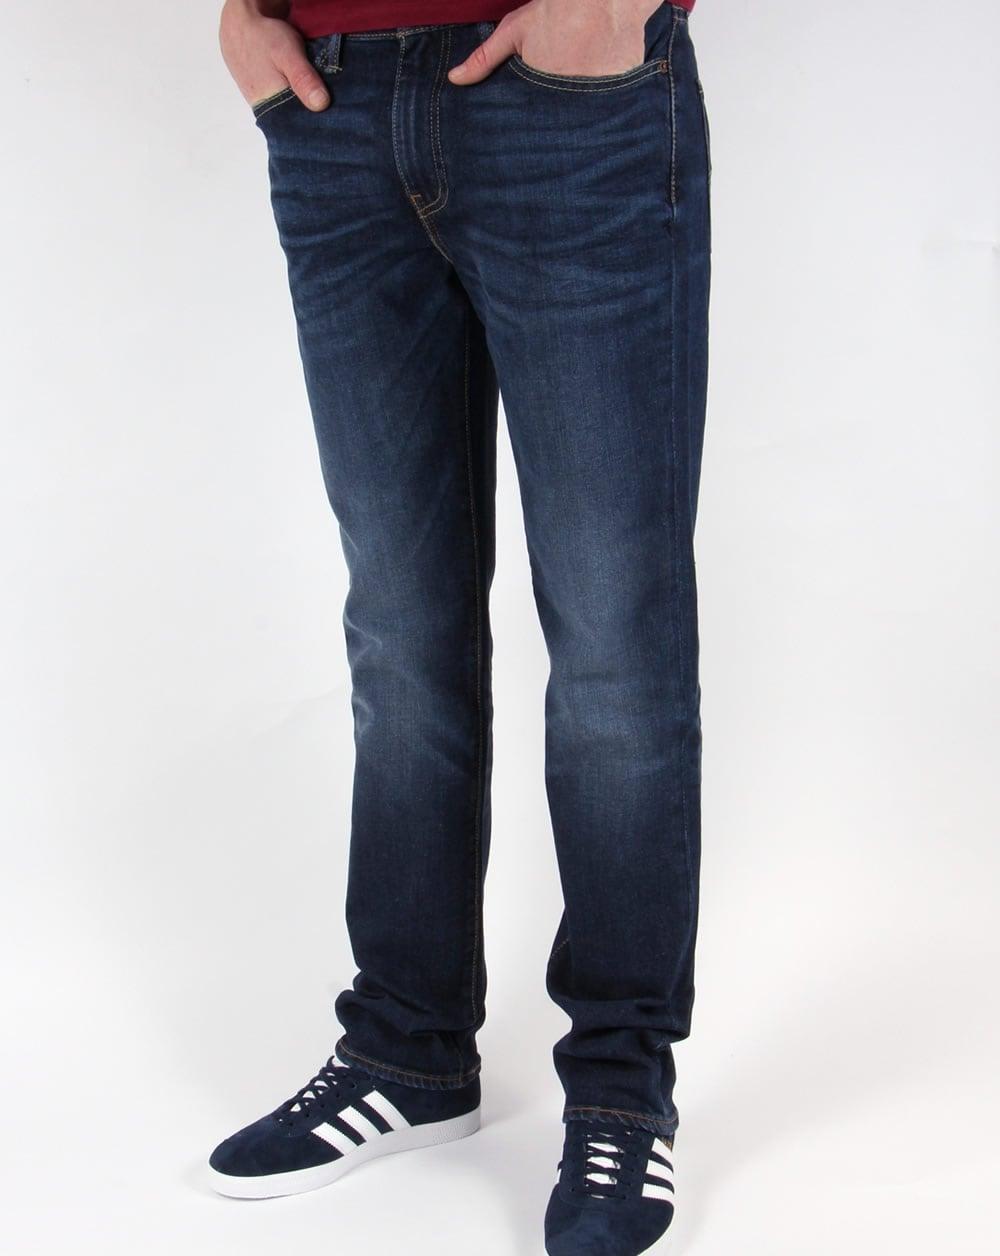 Levis 511 Slim Fit Jeans Brutus Denim Mens